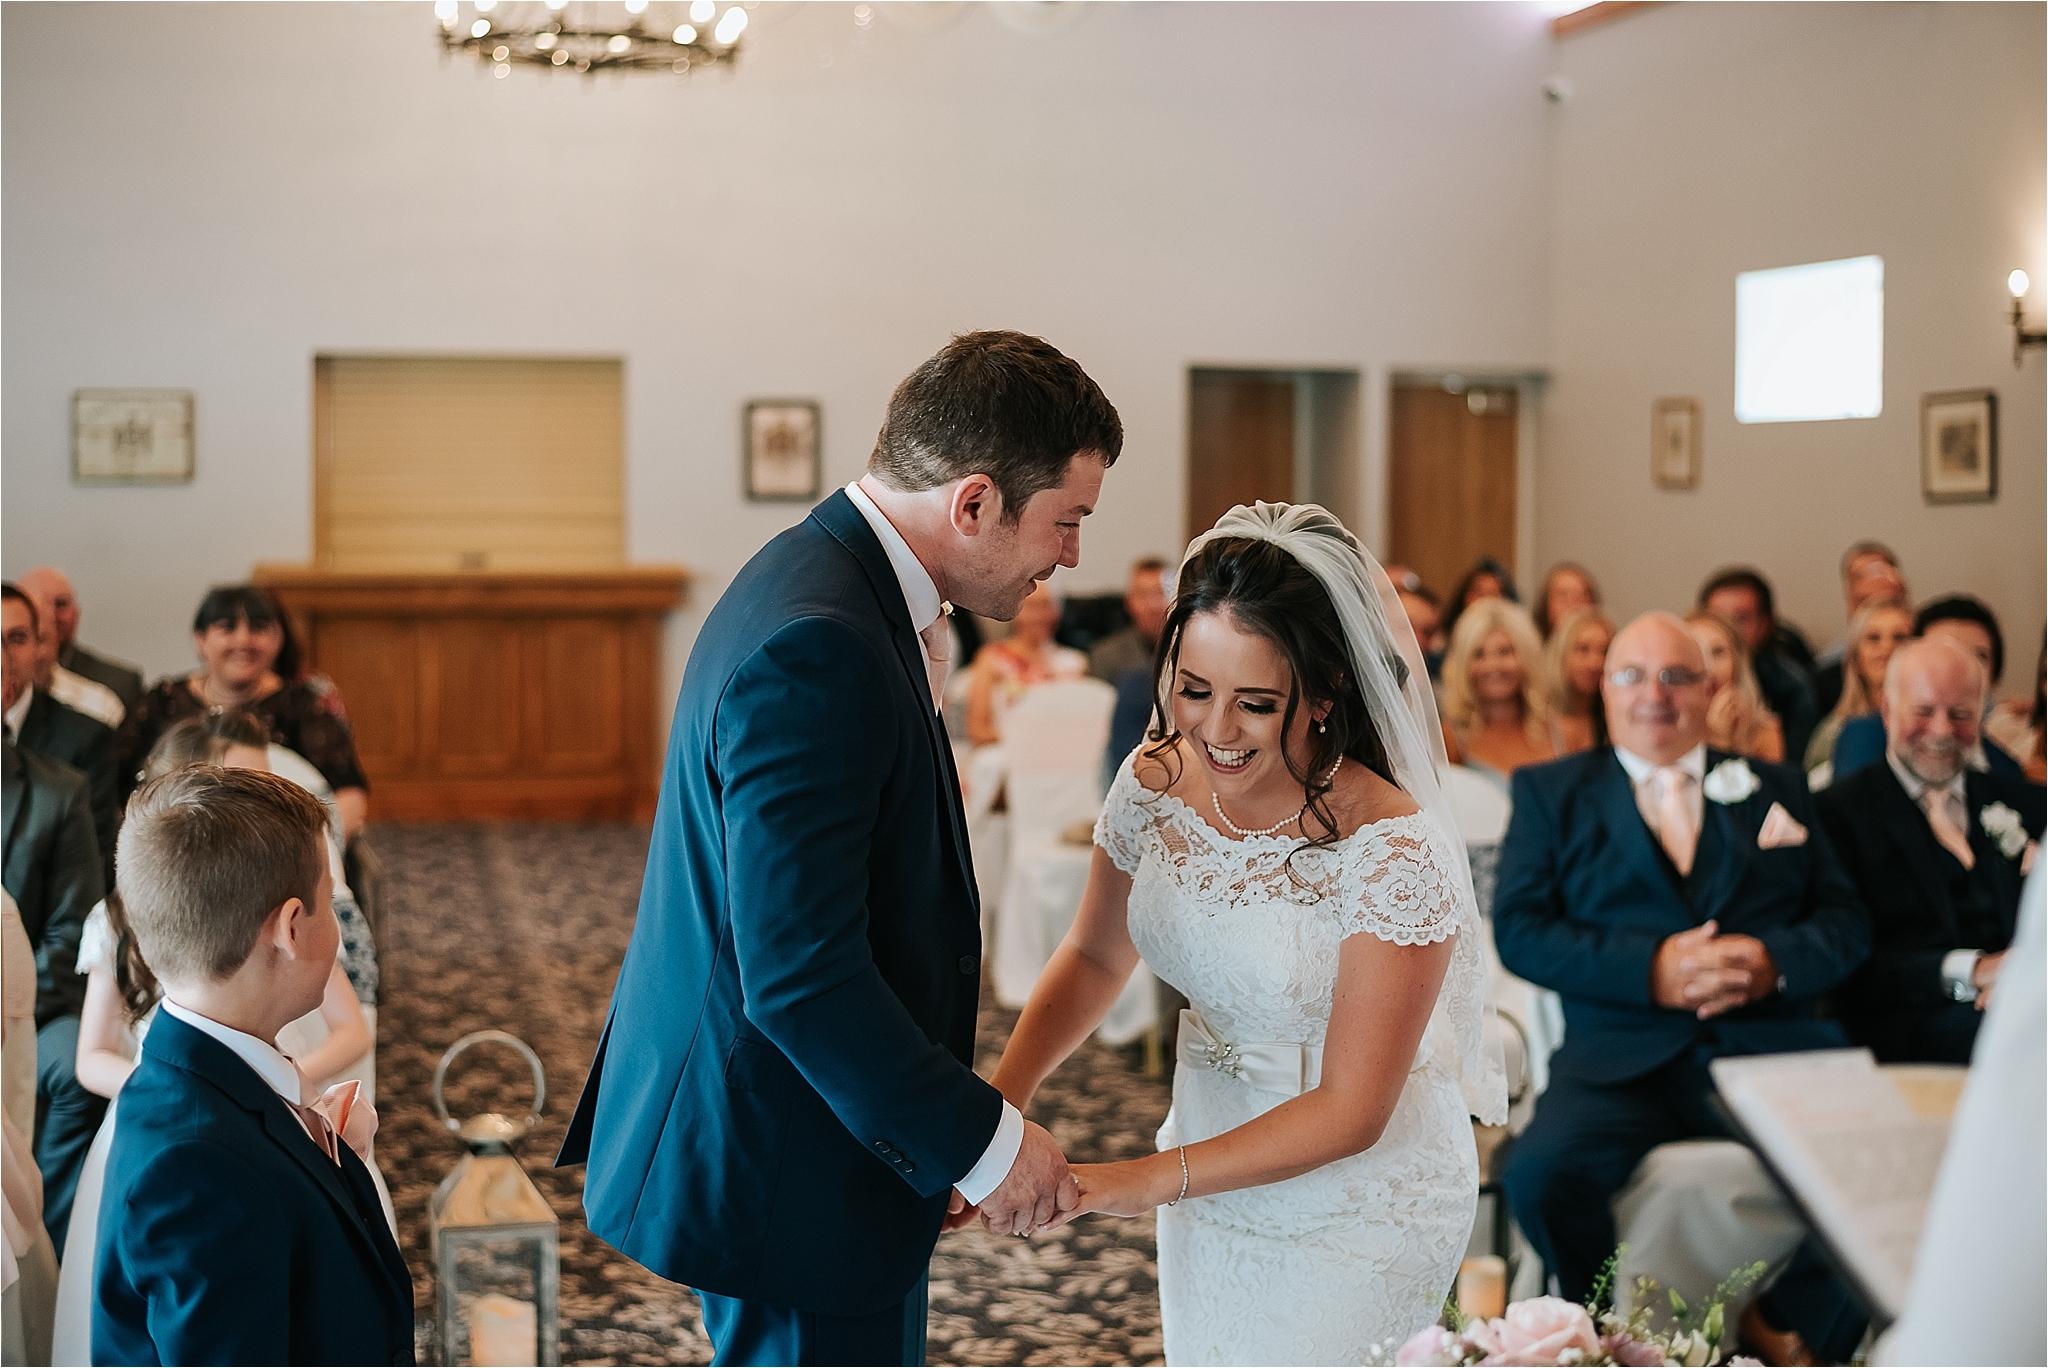 thevilla+lancashire+wreagreen+wedding+photographer32.jpg